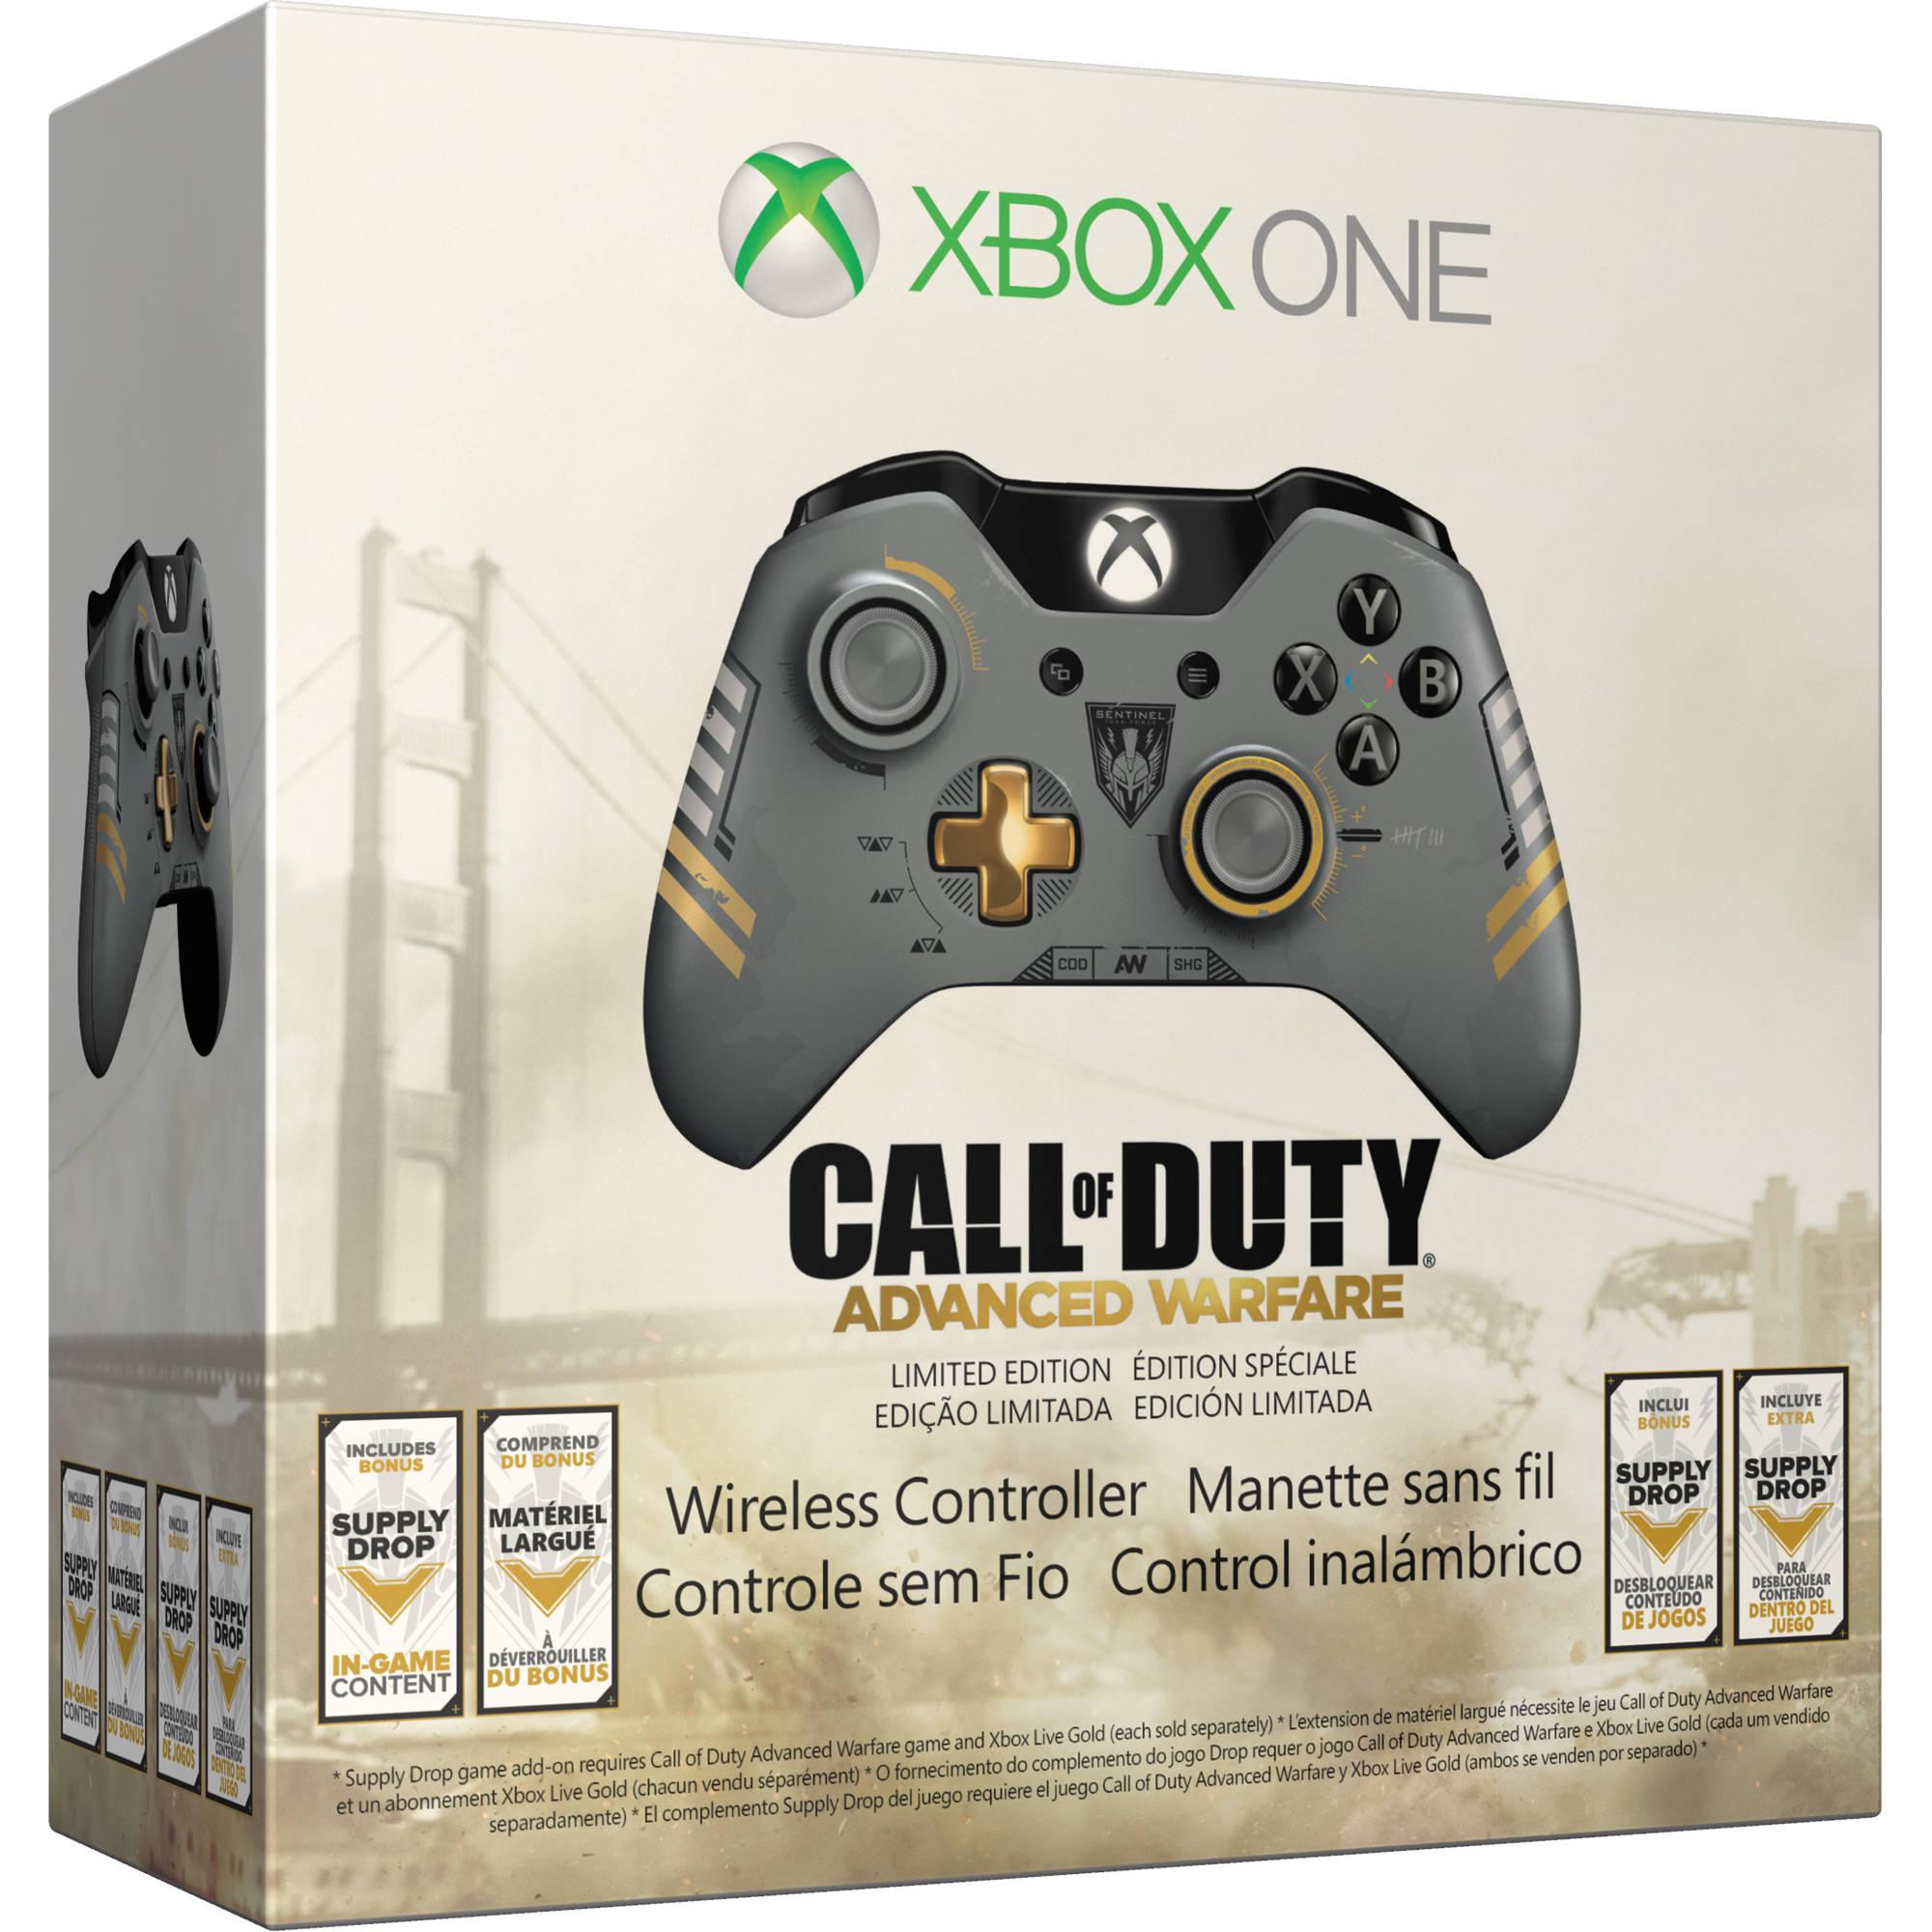 Microsoft xbox one limited edition call of duty advance warfare wireless controller